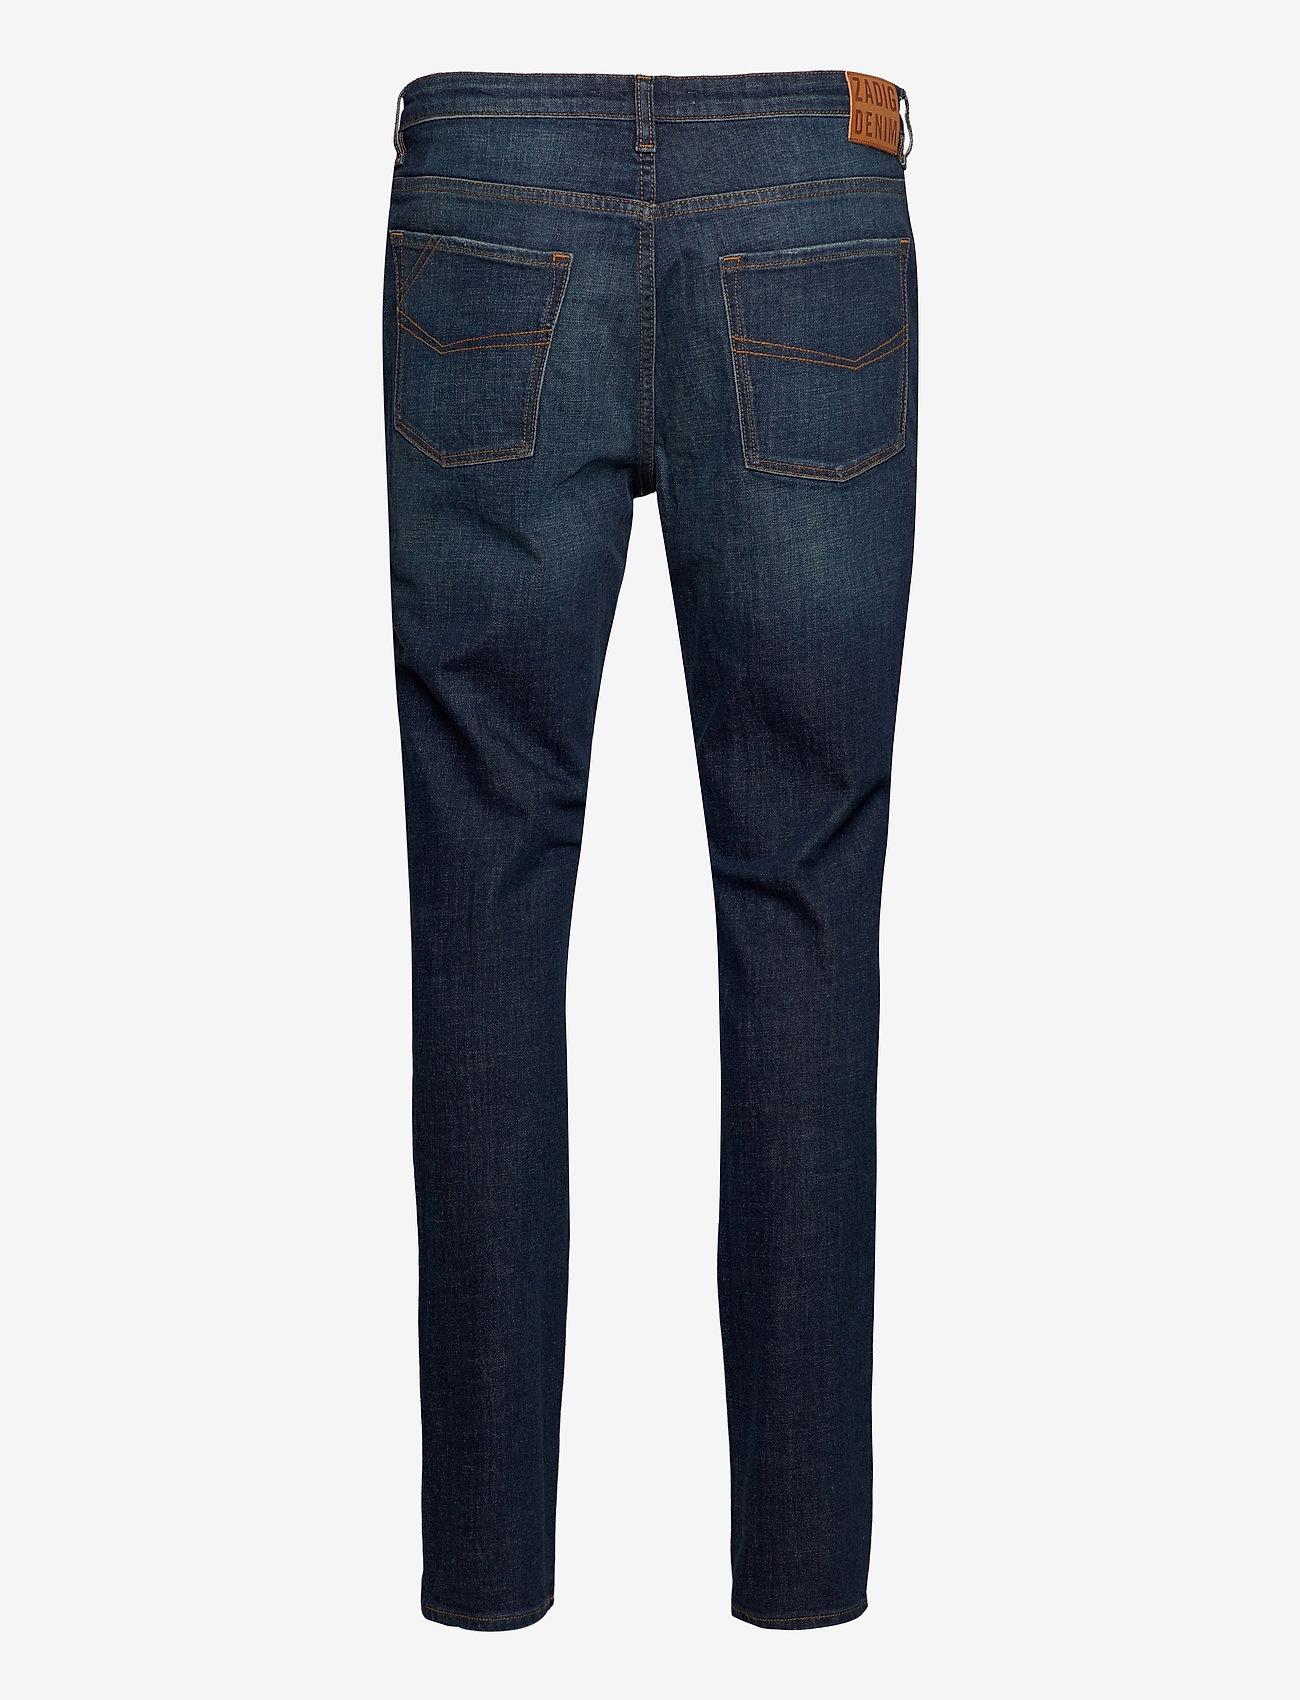 Zadig & Voltaire - DAVID ECO OLD BRUT - slim jeans - blue - 2